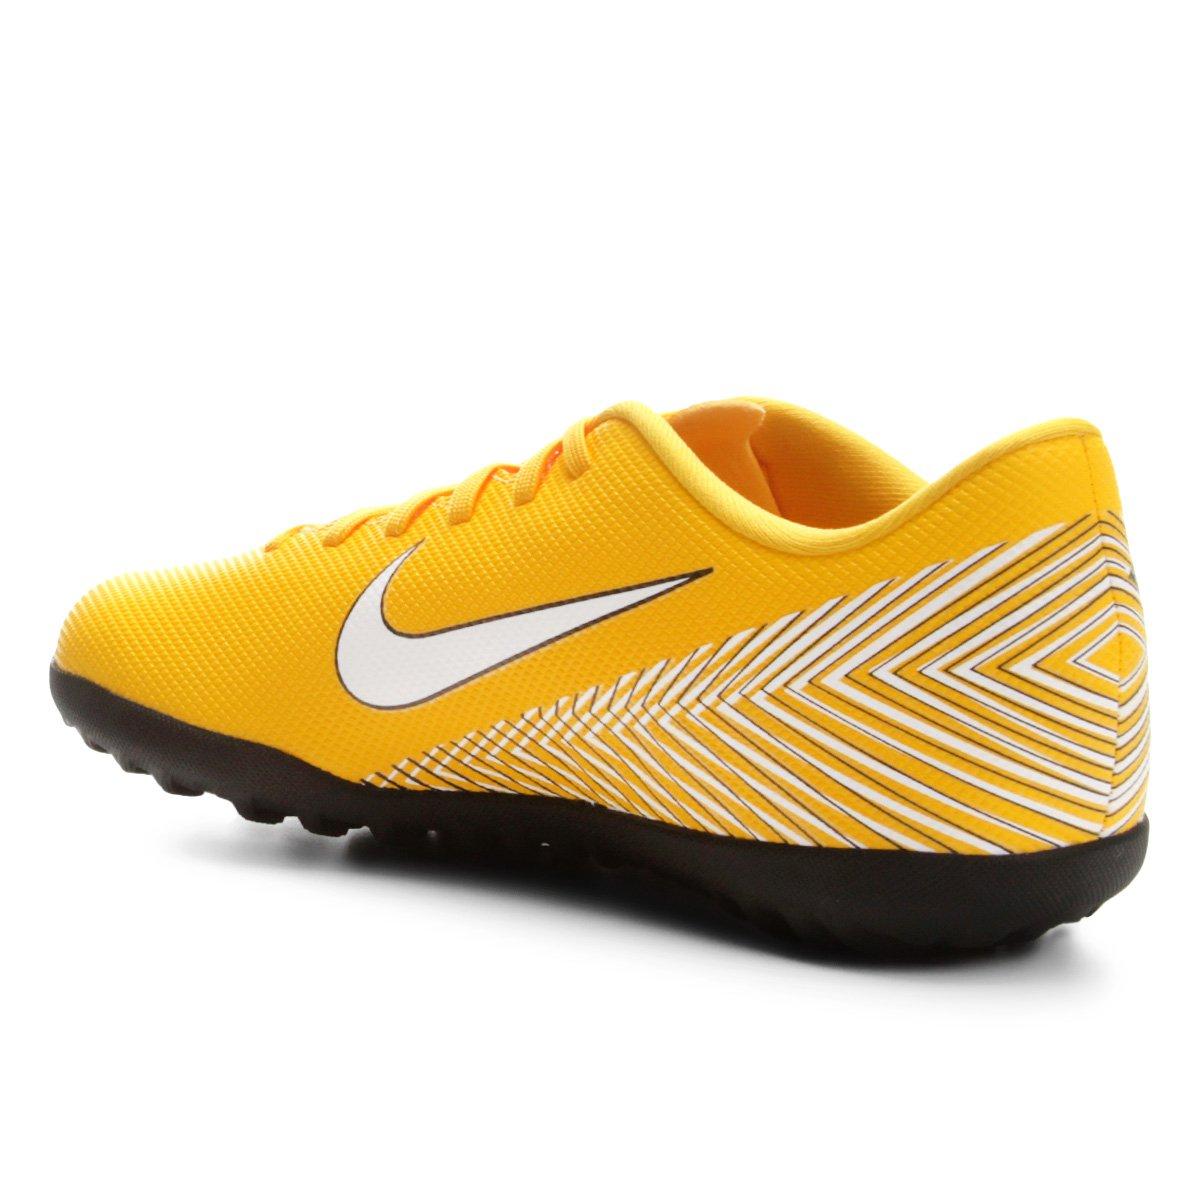 e6449f00fe Chuteira Society Nike Mercurial Vapor 12 Club Neymar TF - Amarelo e ...